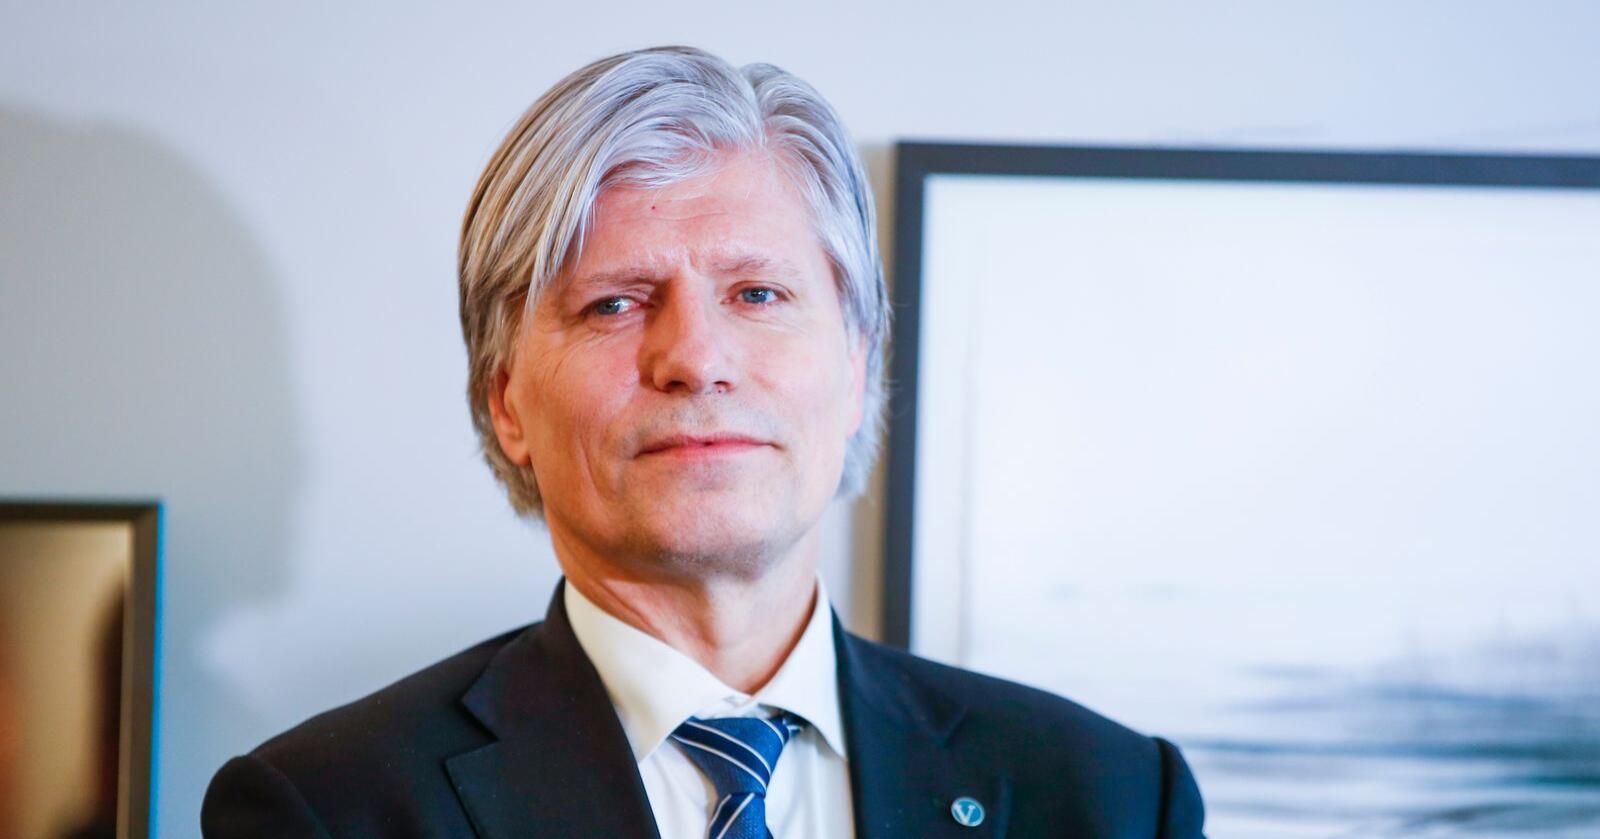 Ola Elvestuen måtte i januar gi fra seg nøkkelen til statsrådskontoret i Klima- og miljødepartementet til Sveinung Rotevatn. Foto: Terje Pedersen / NTB scanpix